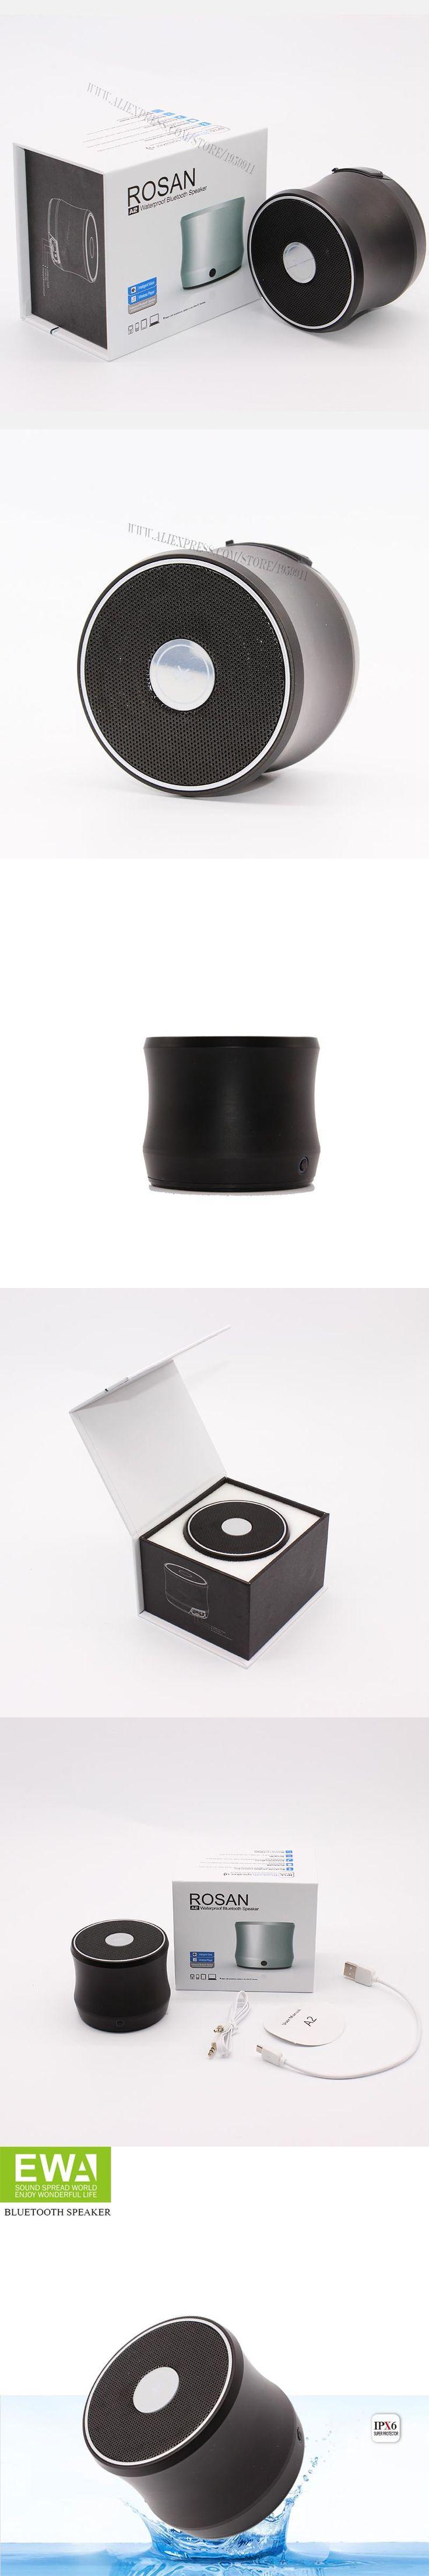 EWA A2 Wireless Bluetooth Speaker  IPX6 Waterproof Portable Bluetooth Speaker For phone /PC Sport Bluetooth Player